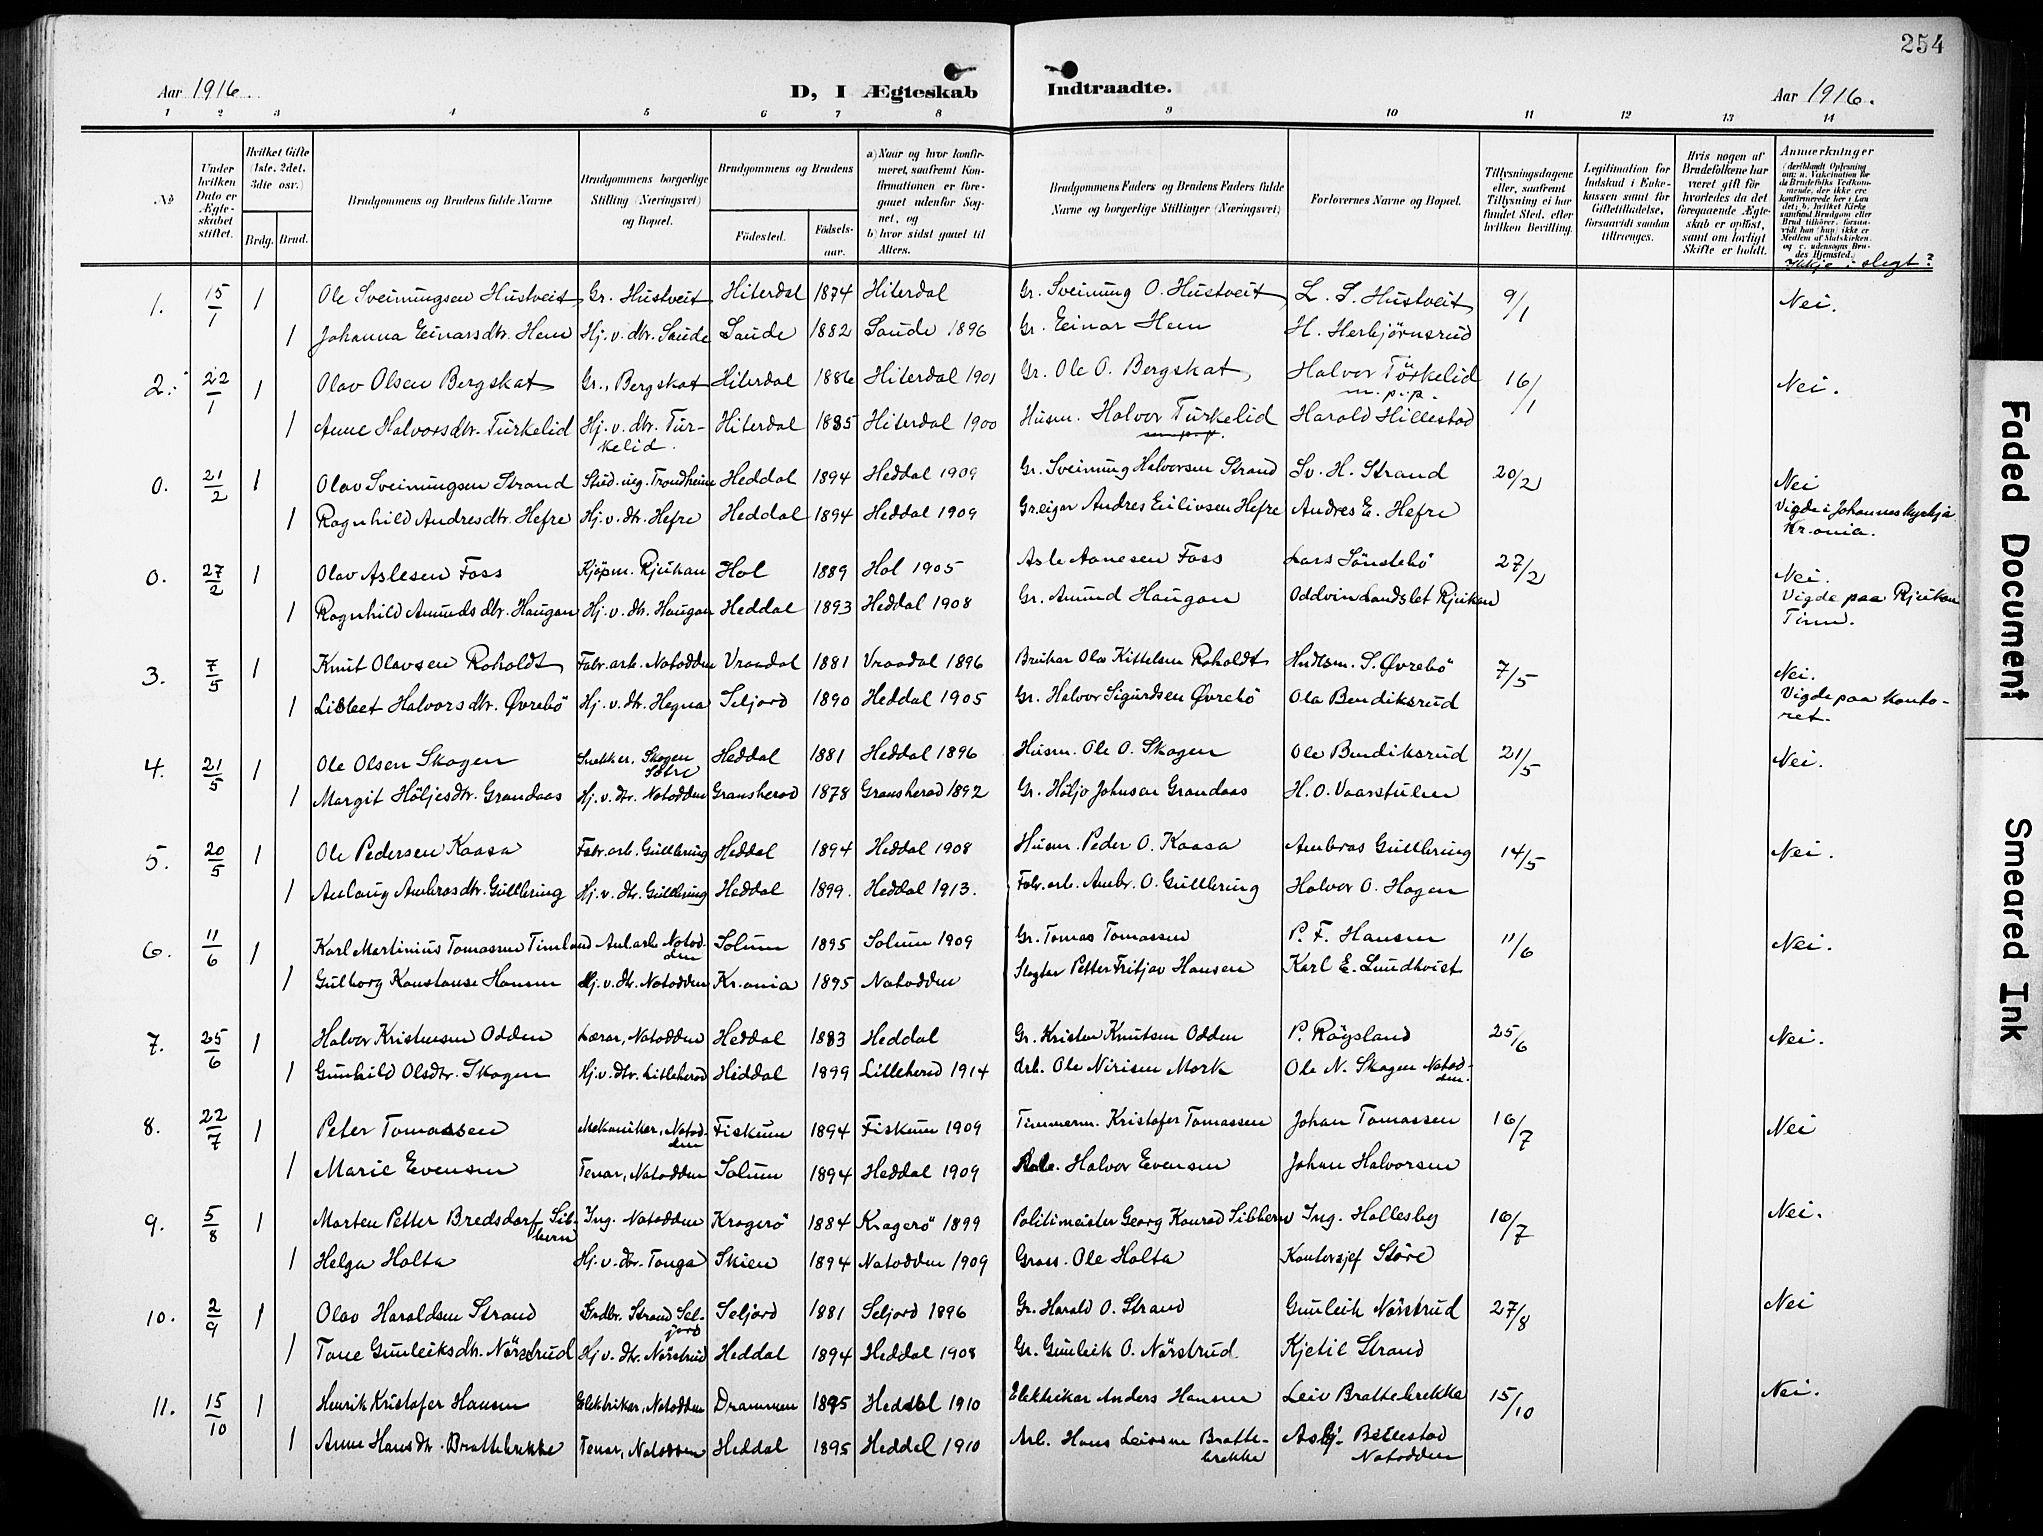 SAKO, Heddal kirkebøker, G/Ga/L0003: Klokkerbok nr. I 3, 1908-1932, s. 254